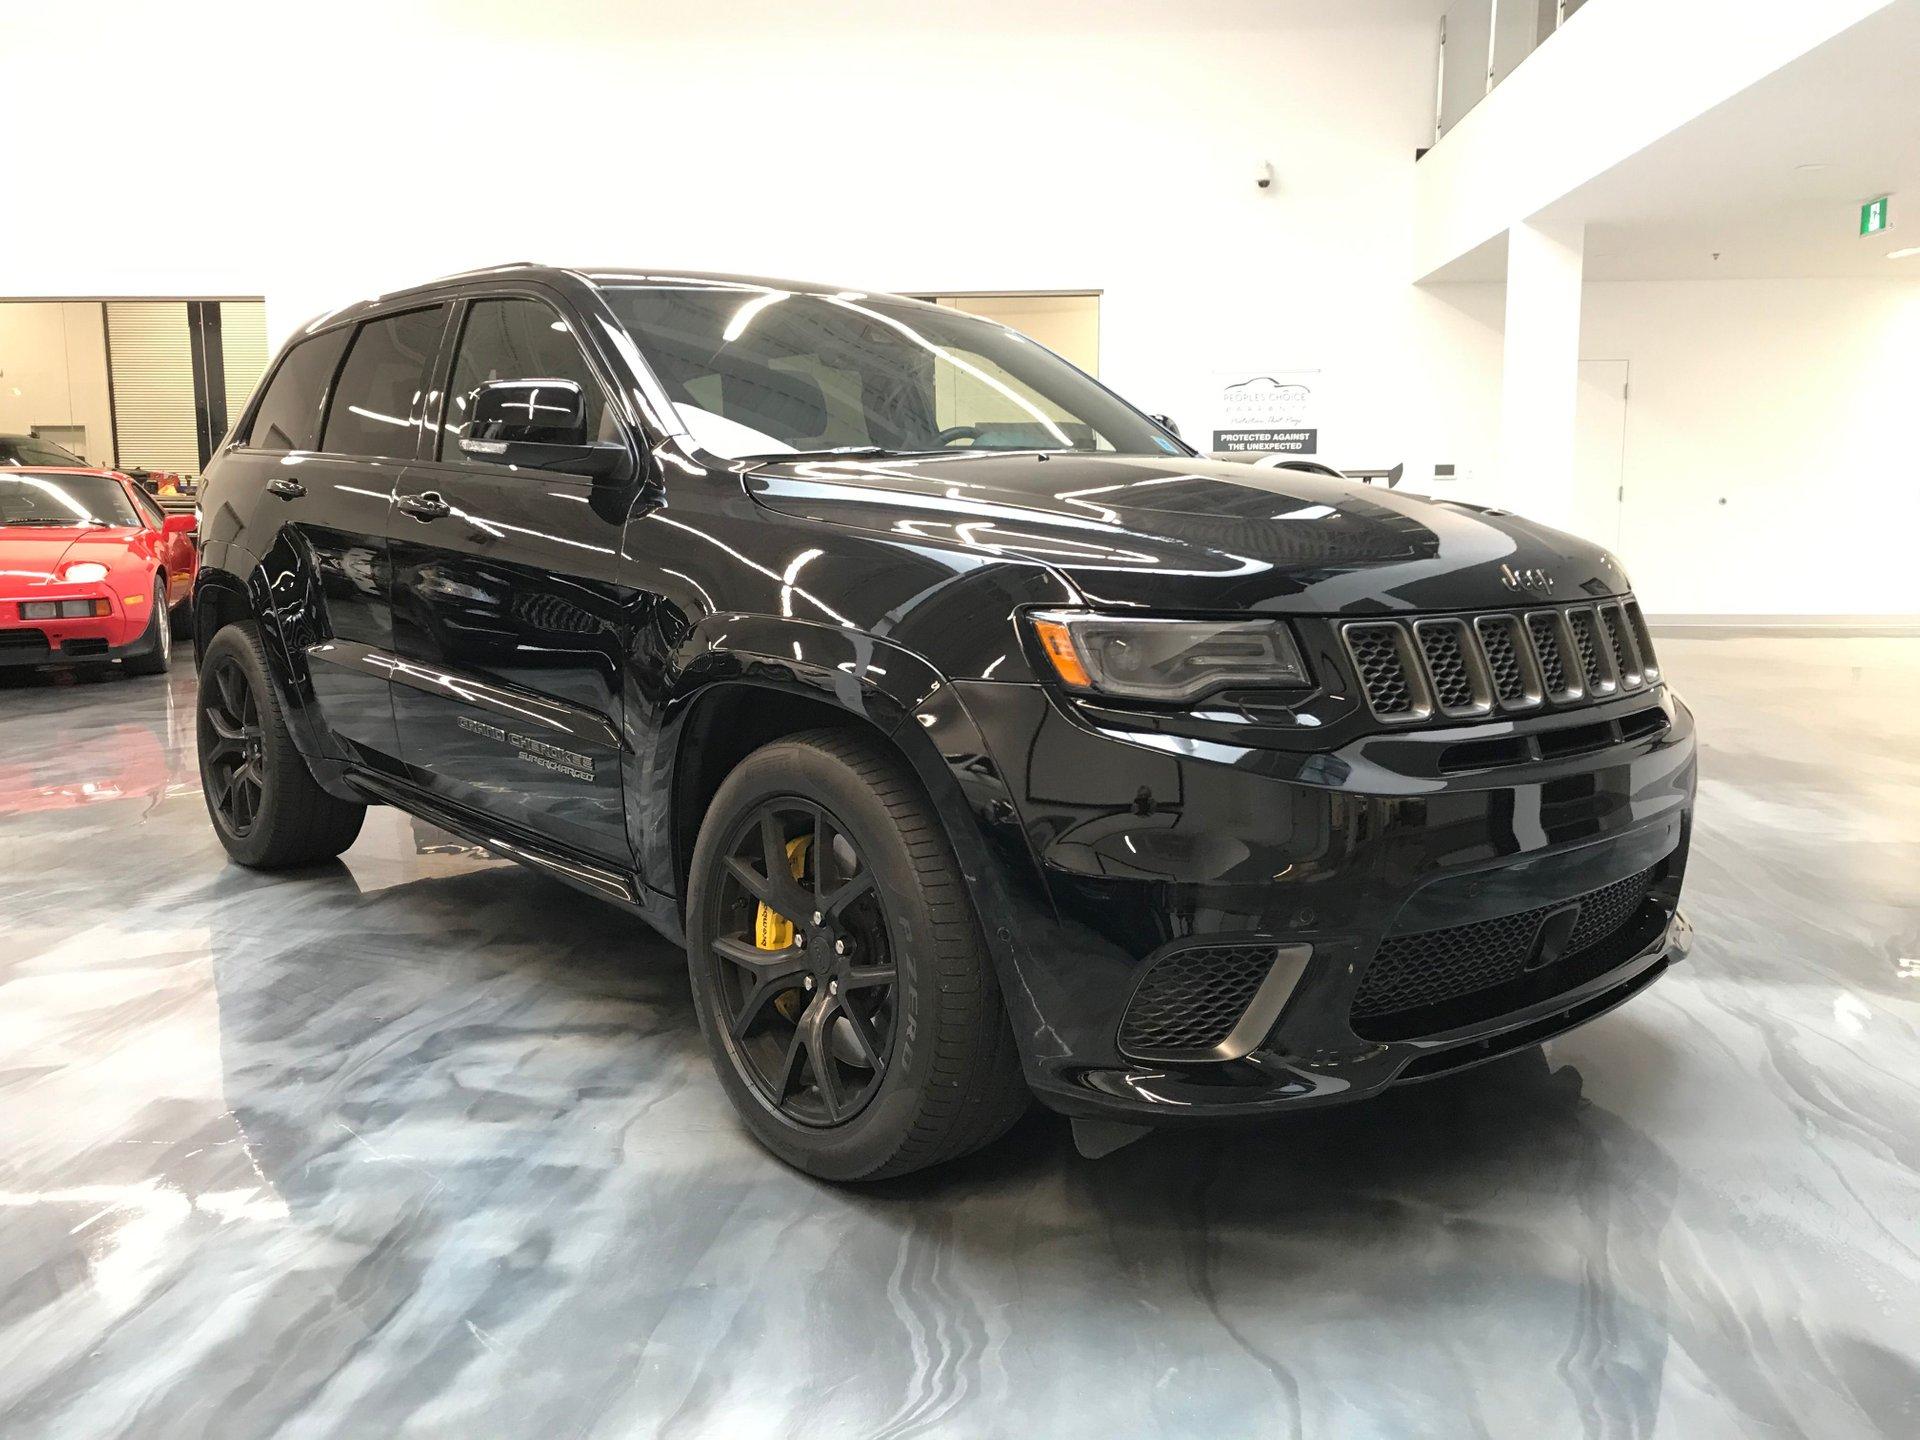 2018 jeep grand cherokee trackhawk sold thx